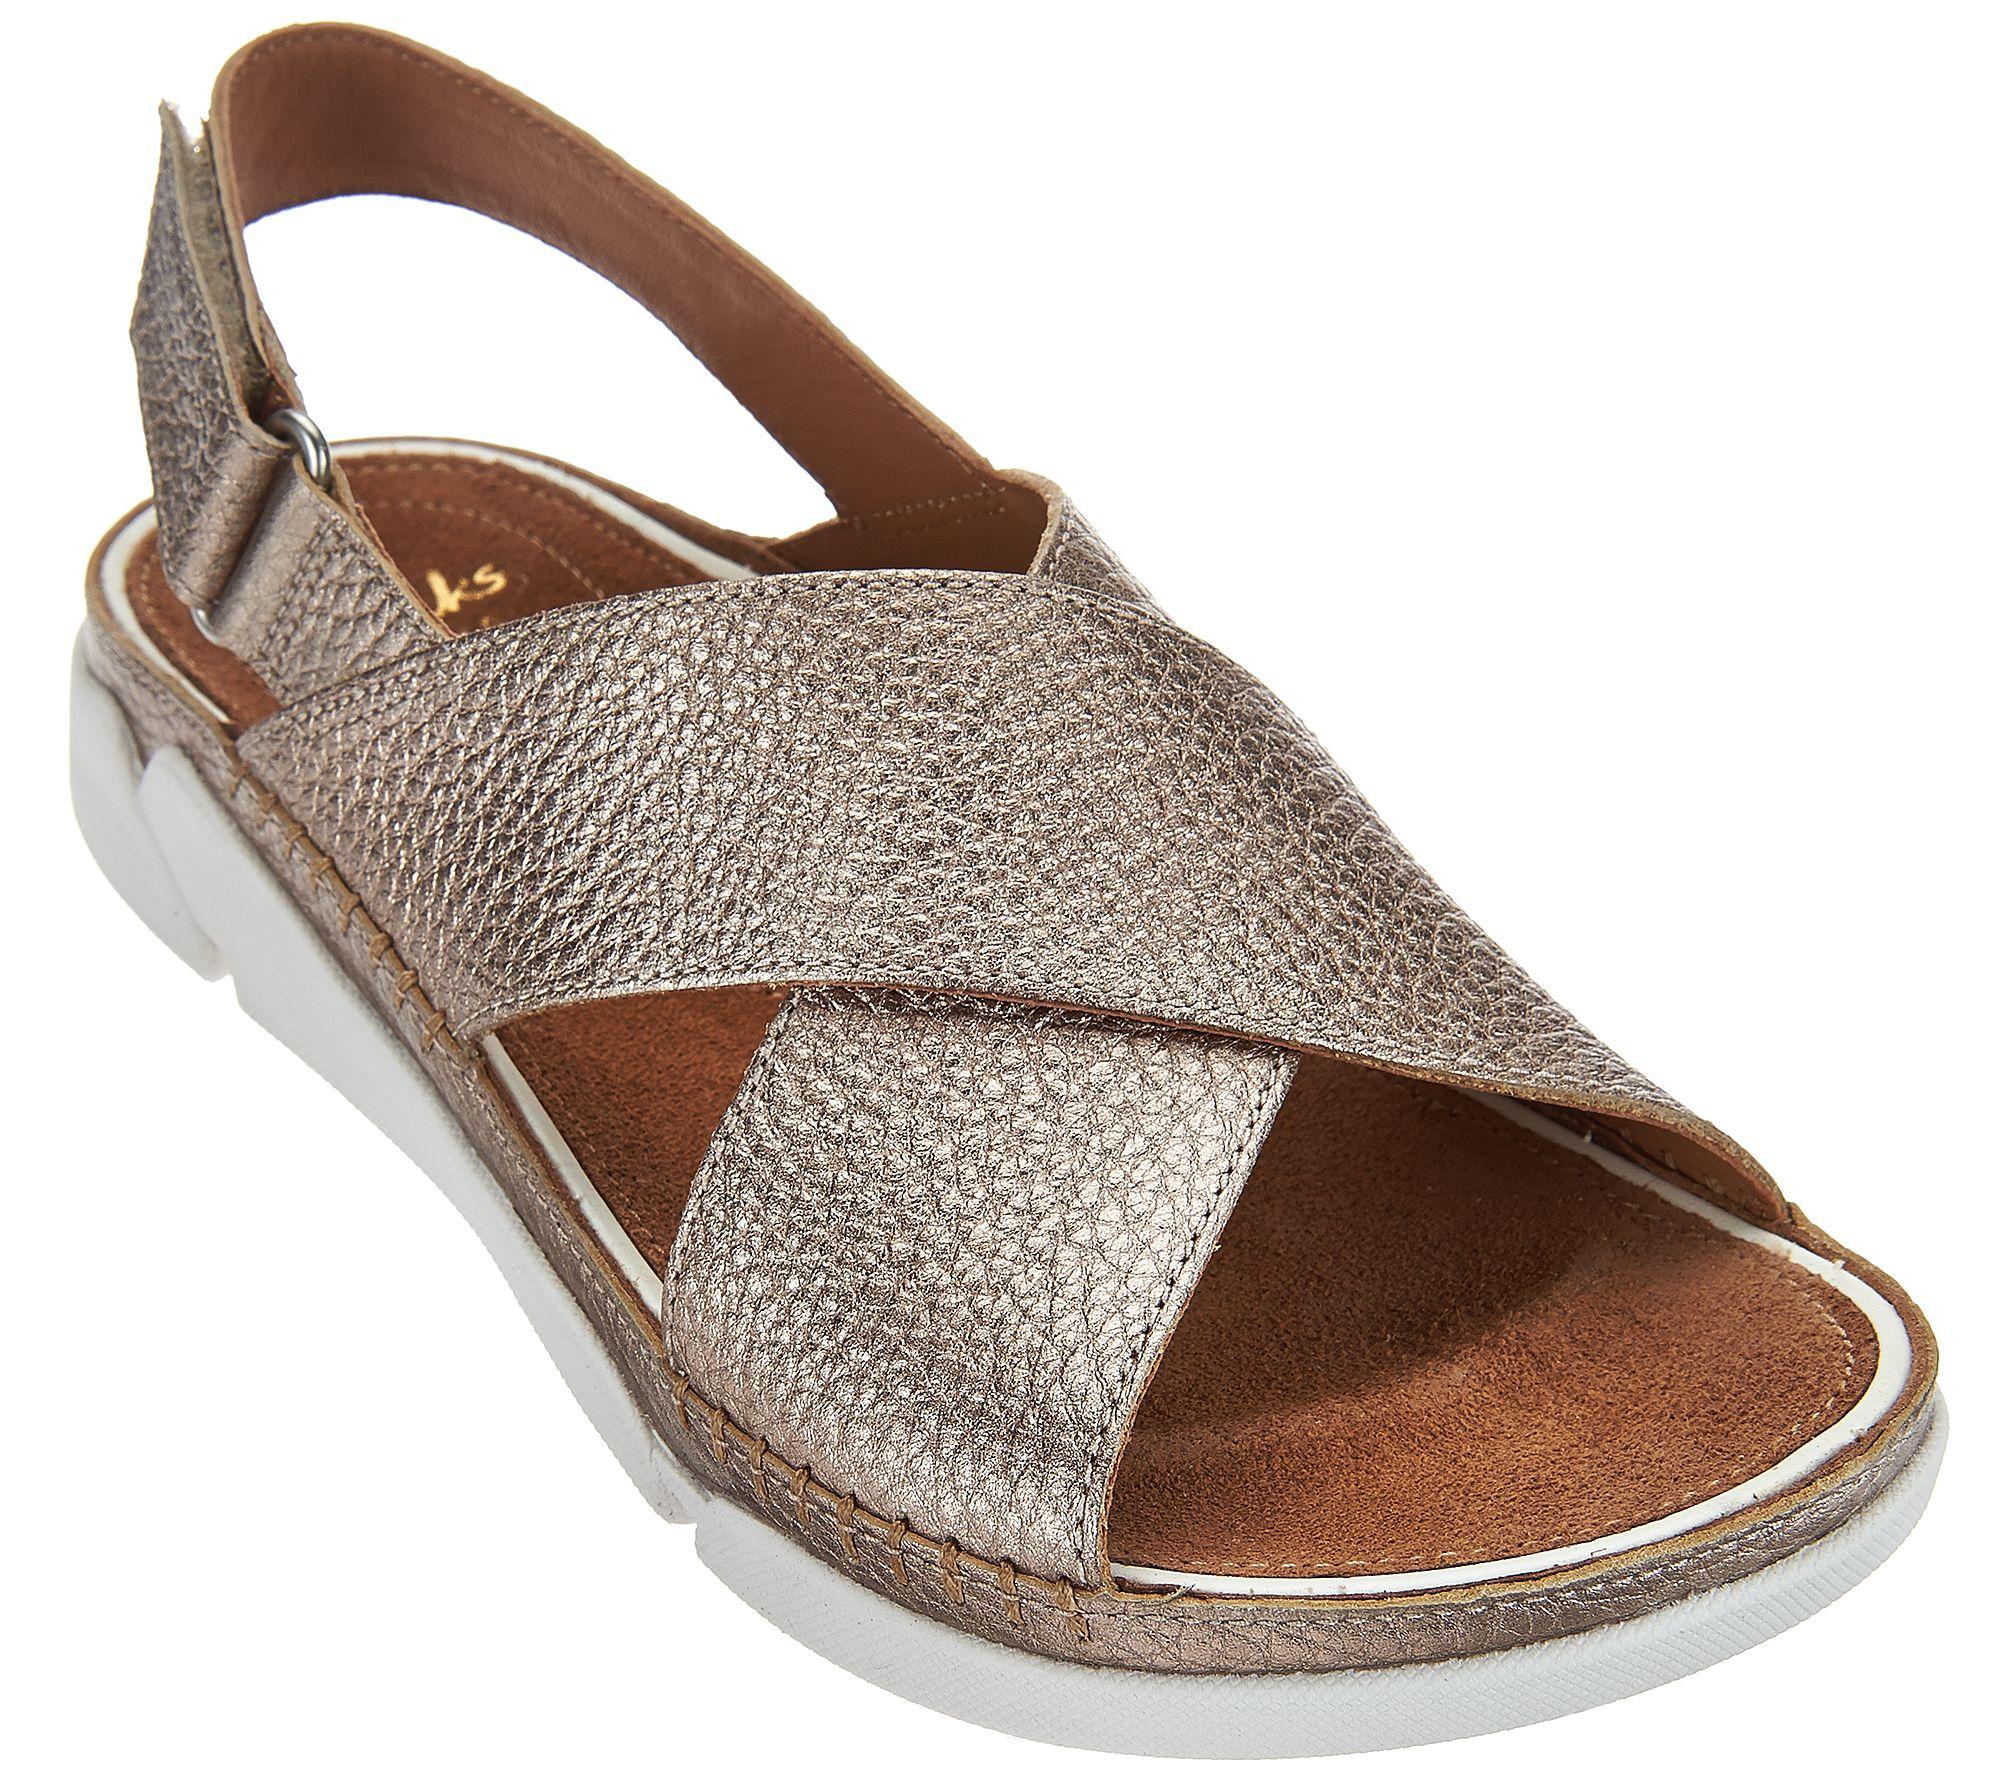 99fef652f804c Clarks Artisan Leather Cross Strap Sandals - Tri Alexia - Page 1 — QVC.com